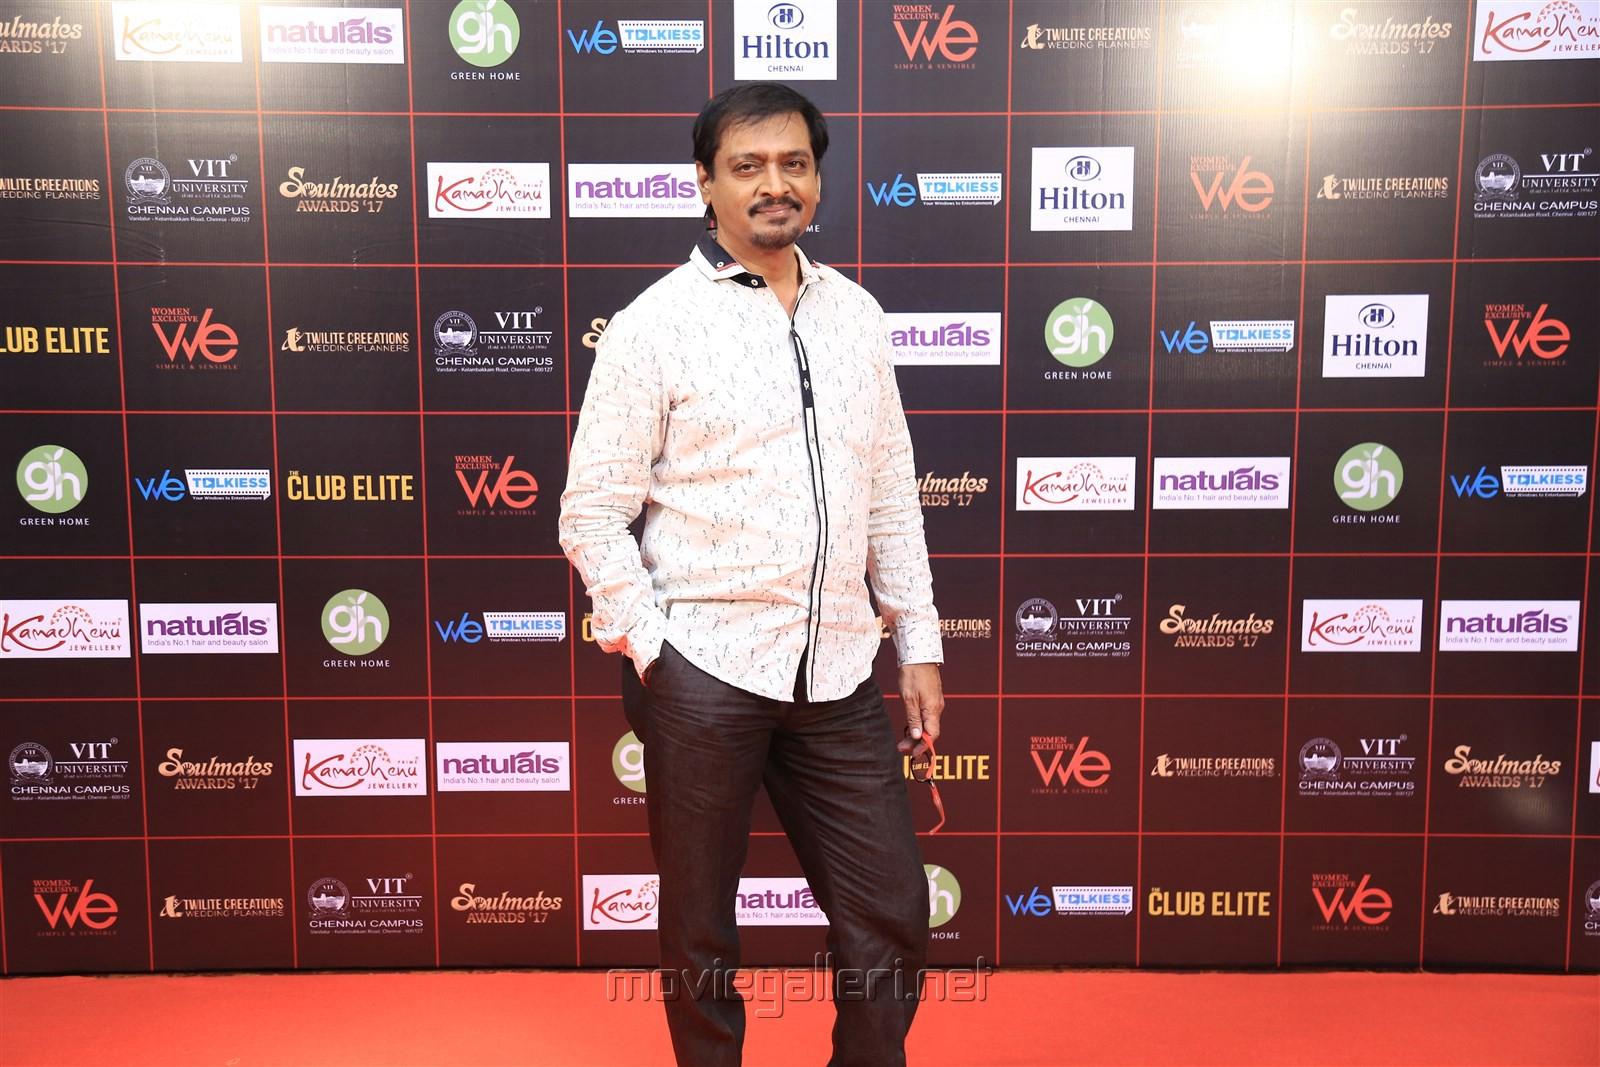 Venu Aravind @ Soulmates Awards 2017 Event Photos